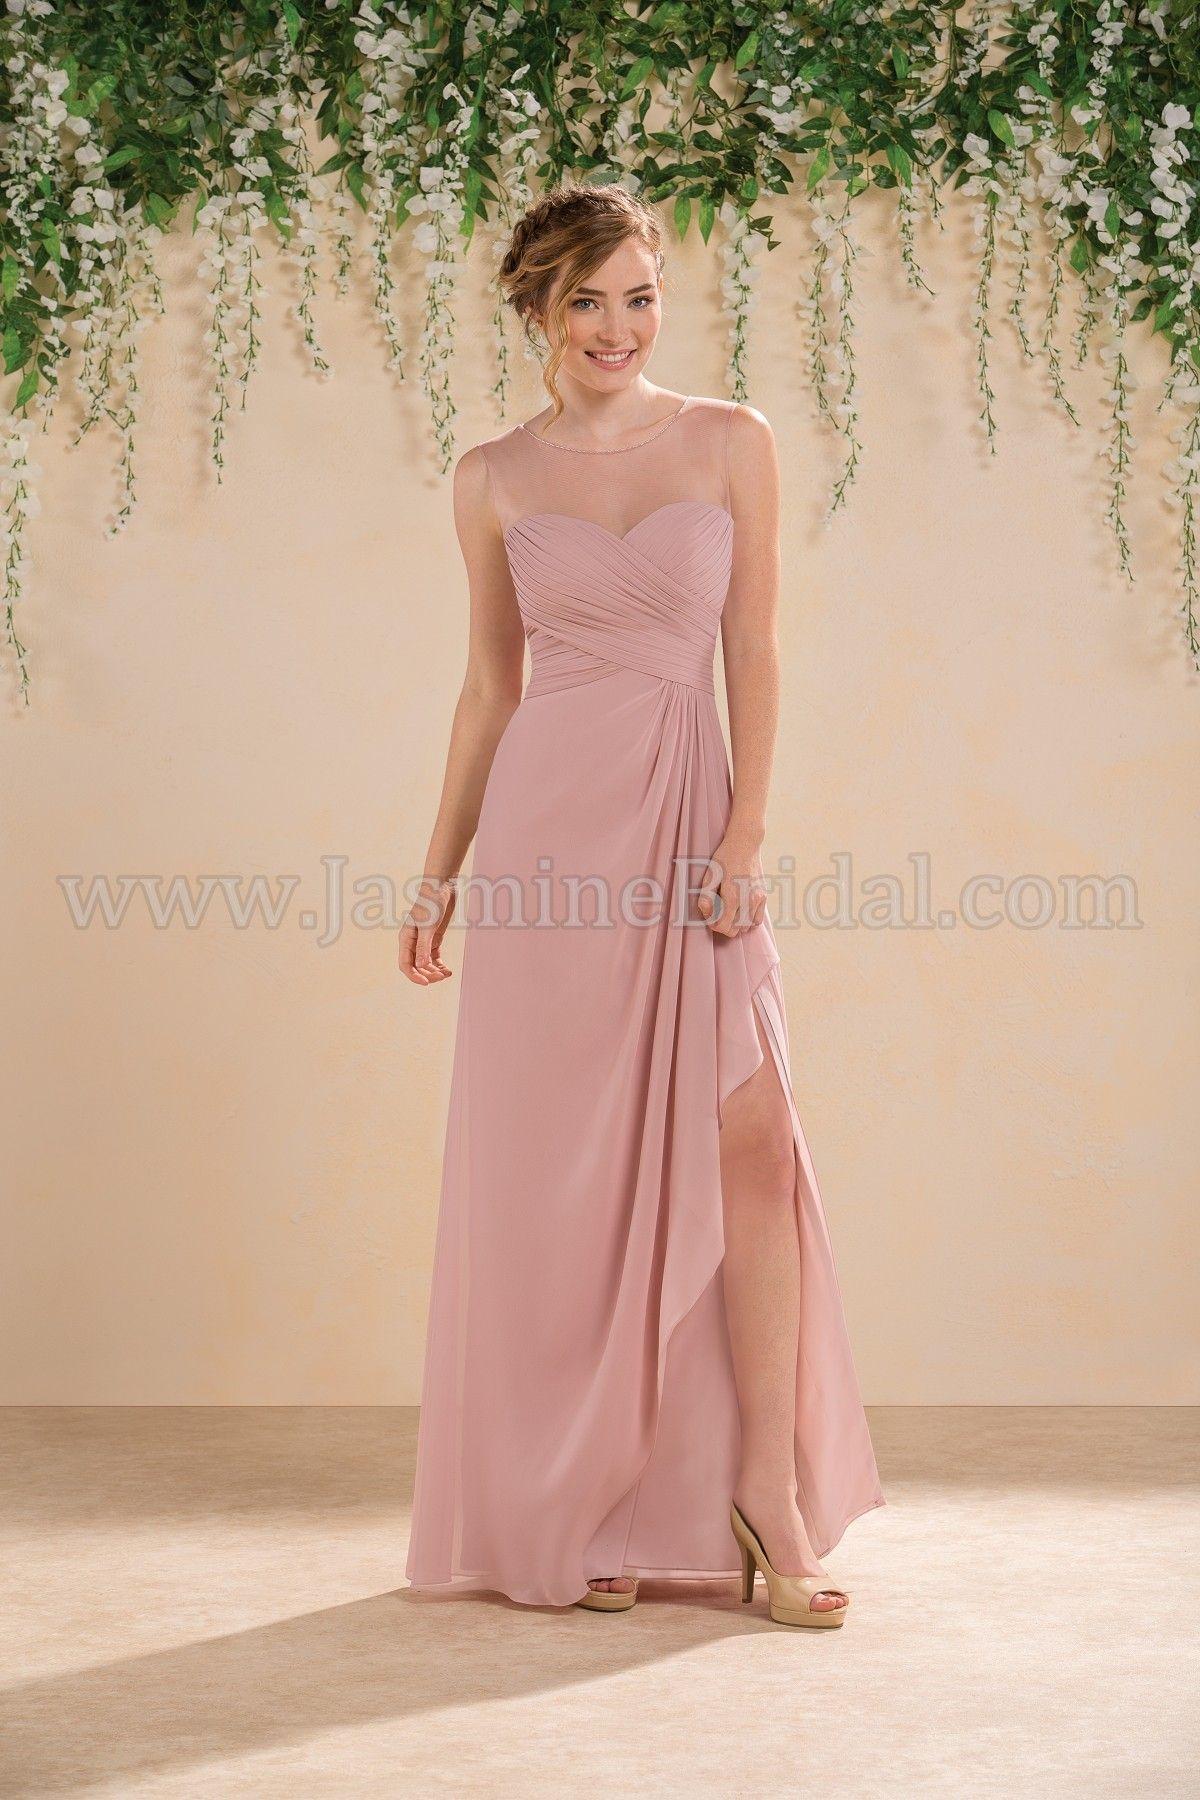 Jasmine Bridal Bridesmaid Dress B2 Style B183013 in Misty Pink ...